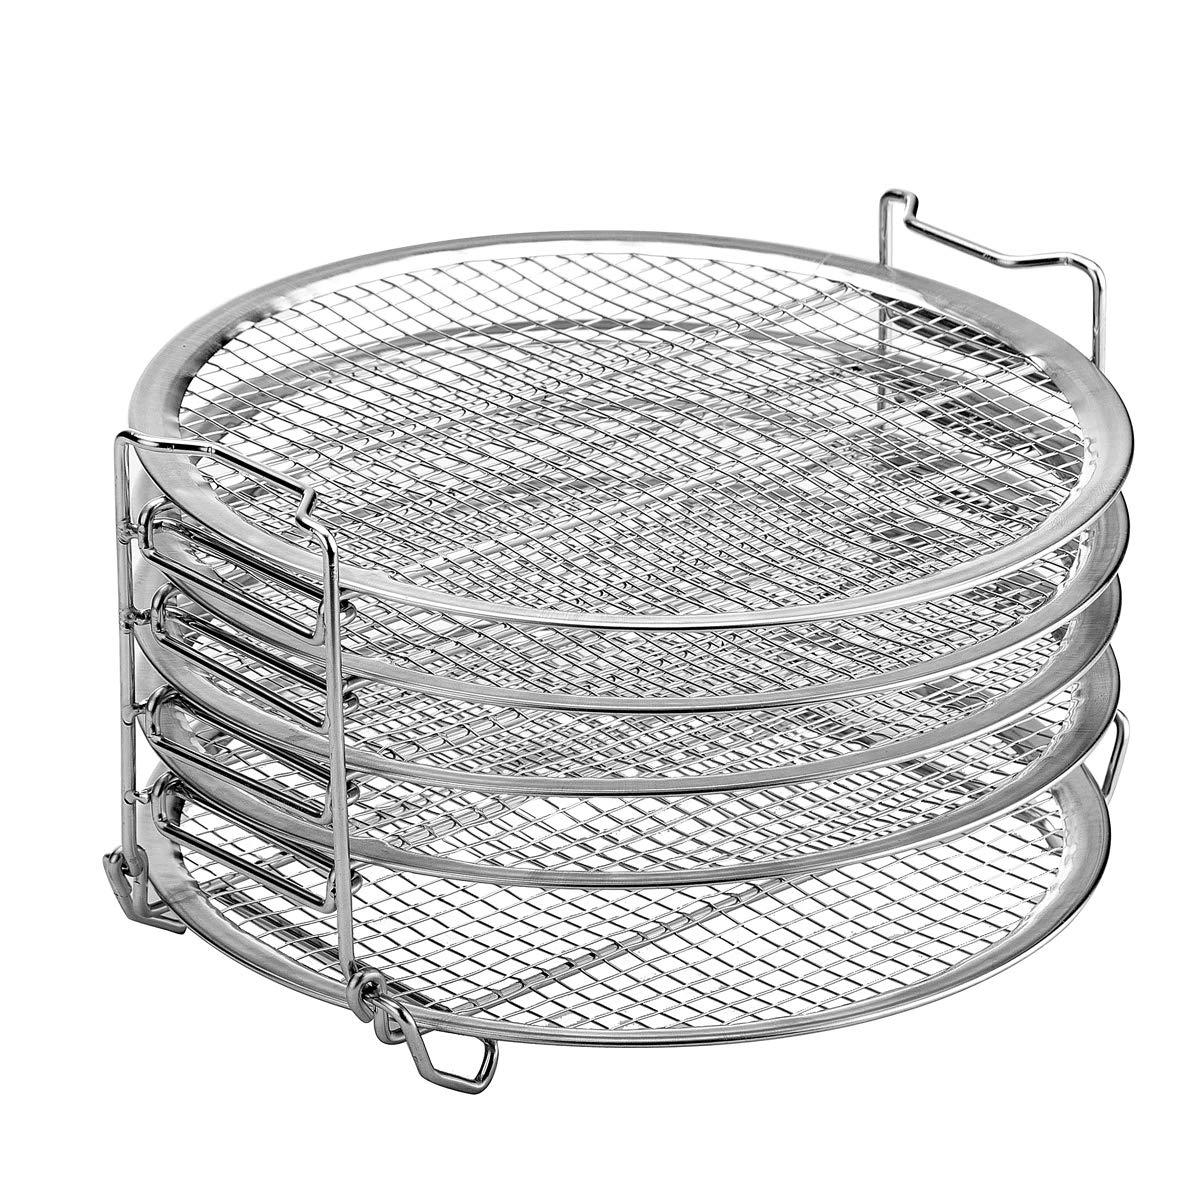 Dehydrator Stand For Ninja Foodi Accesories, 6.5 qt & 8 qt, Food Grade Stainless Steel (6.5&8) by Kispog